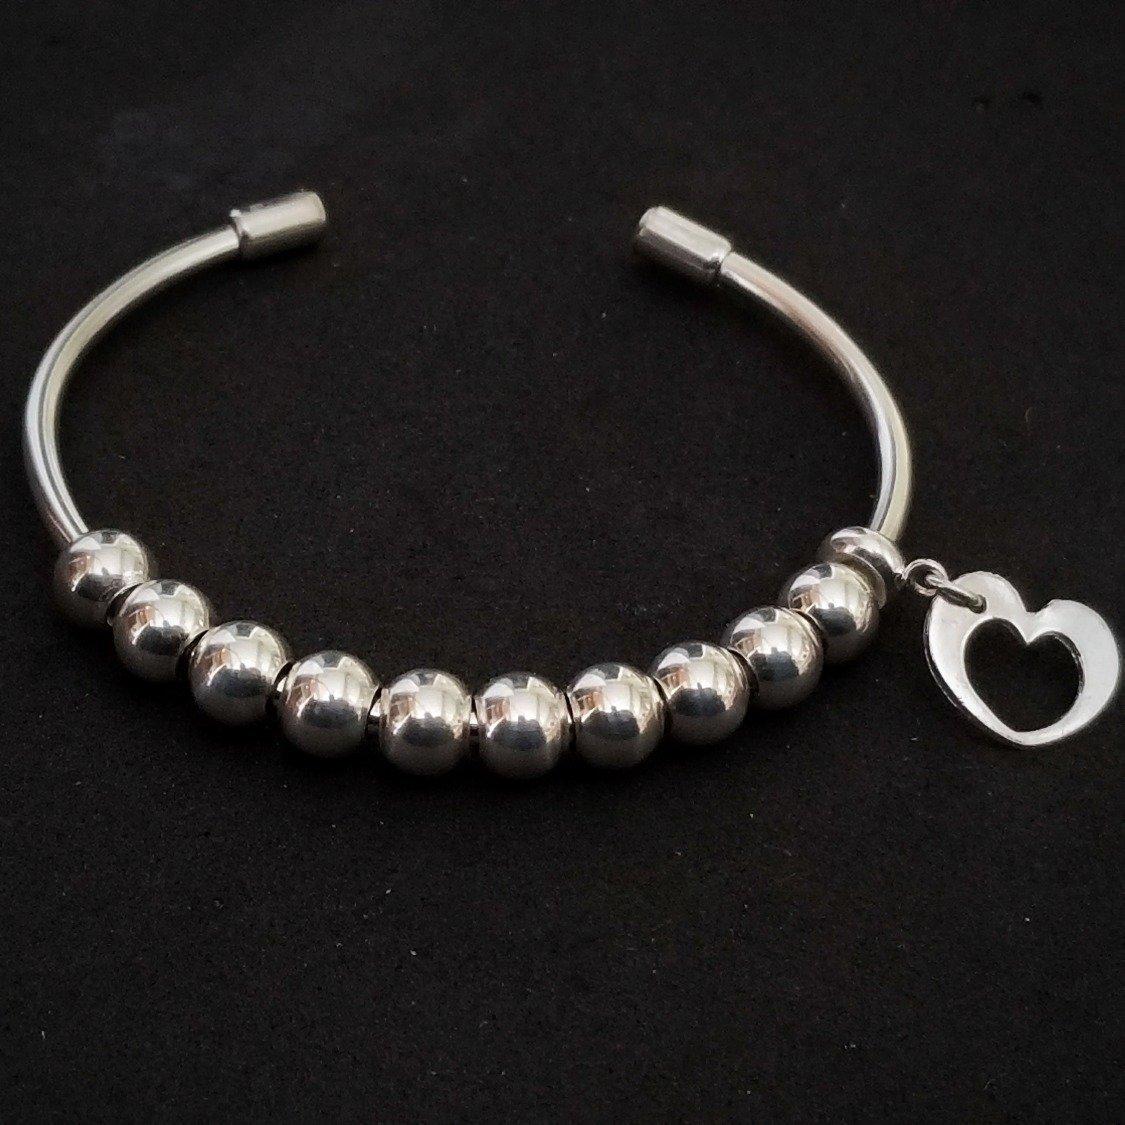 Blessings | Gratitude Bracelet | Sterling Silver | Beads Slide to Count Your Blessings